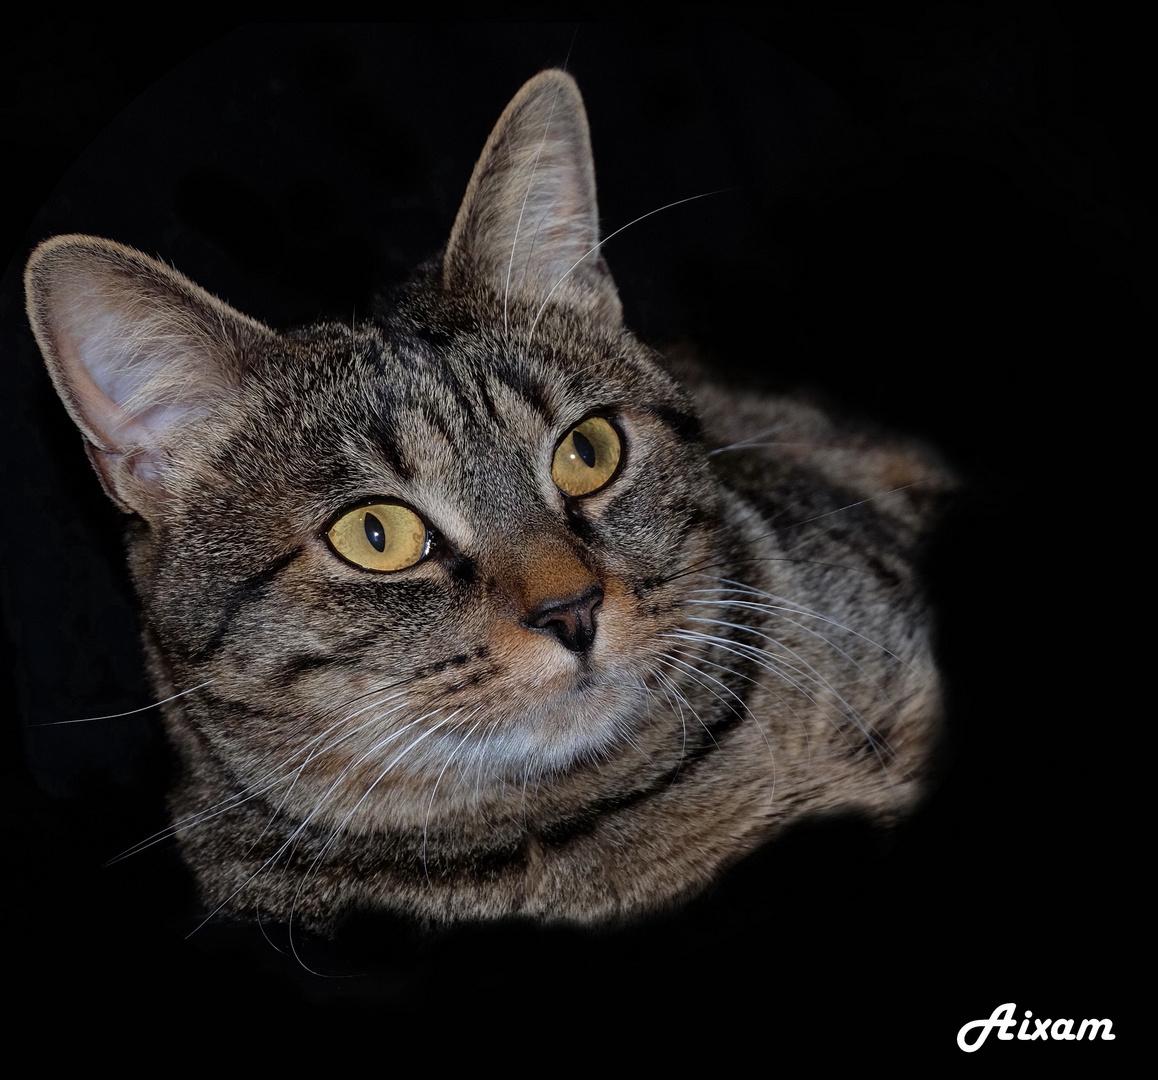 Portrait d' Aixam